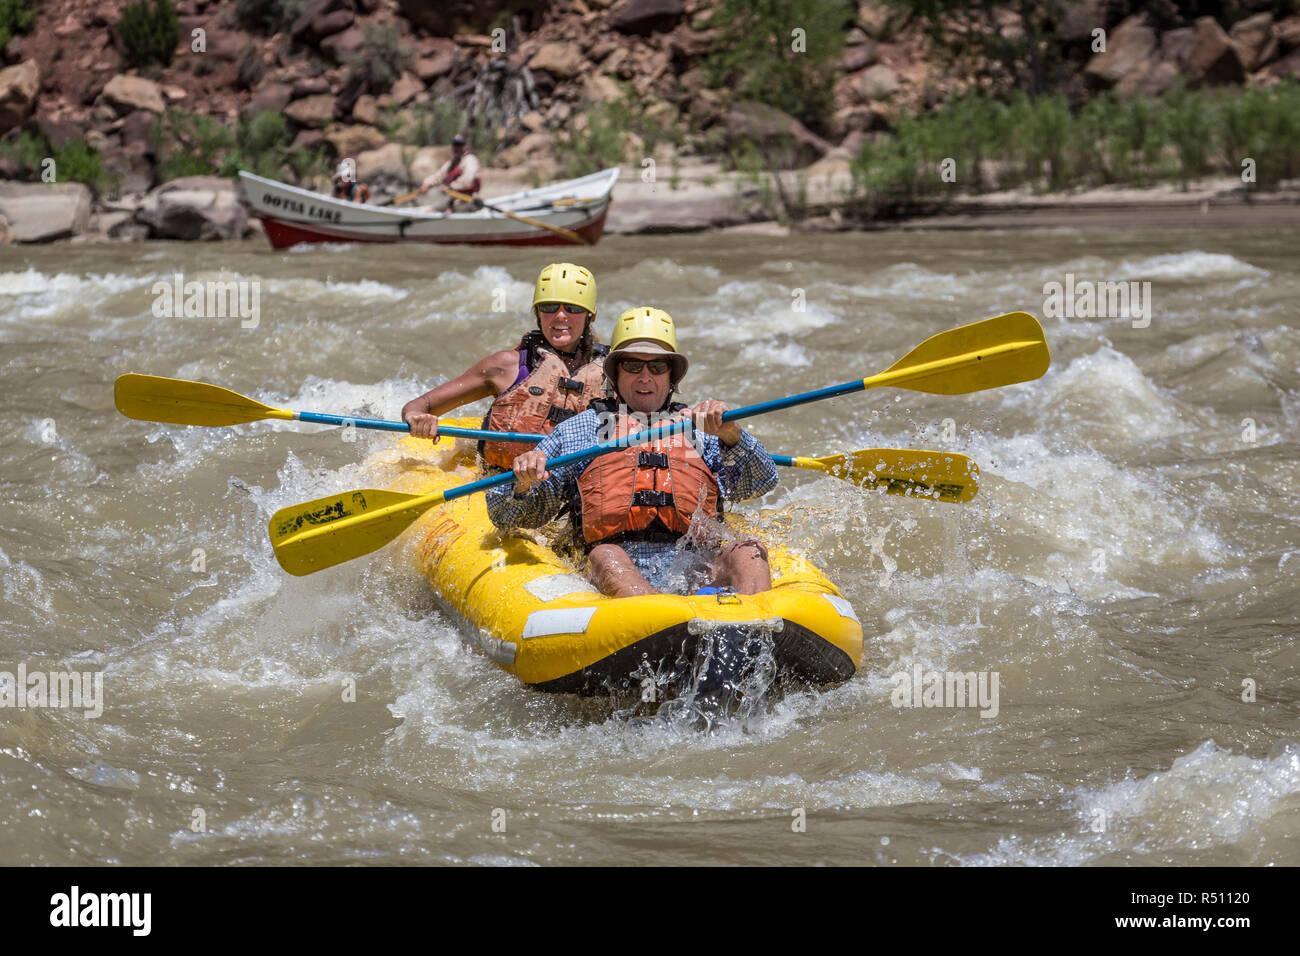 A man and woman paddling aninflatablekayak through rapids on a Green river rafting trip, Desolation/GrayCanyon section, Utah, USA - Stock Image